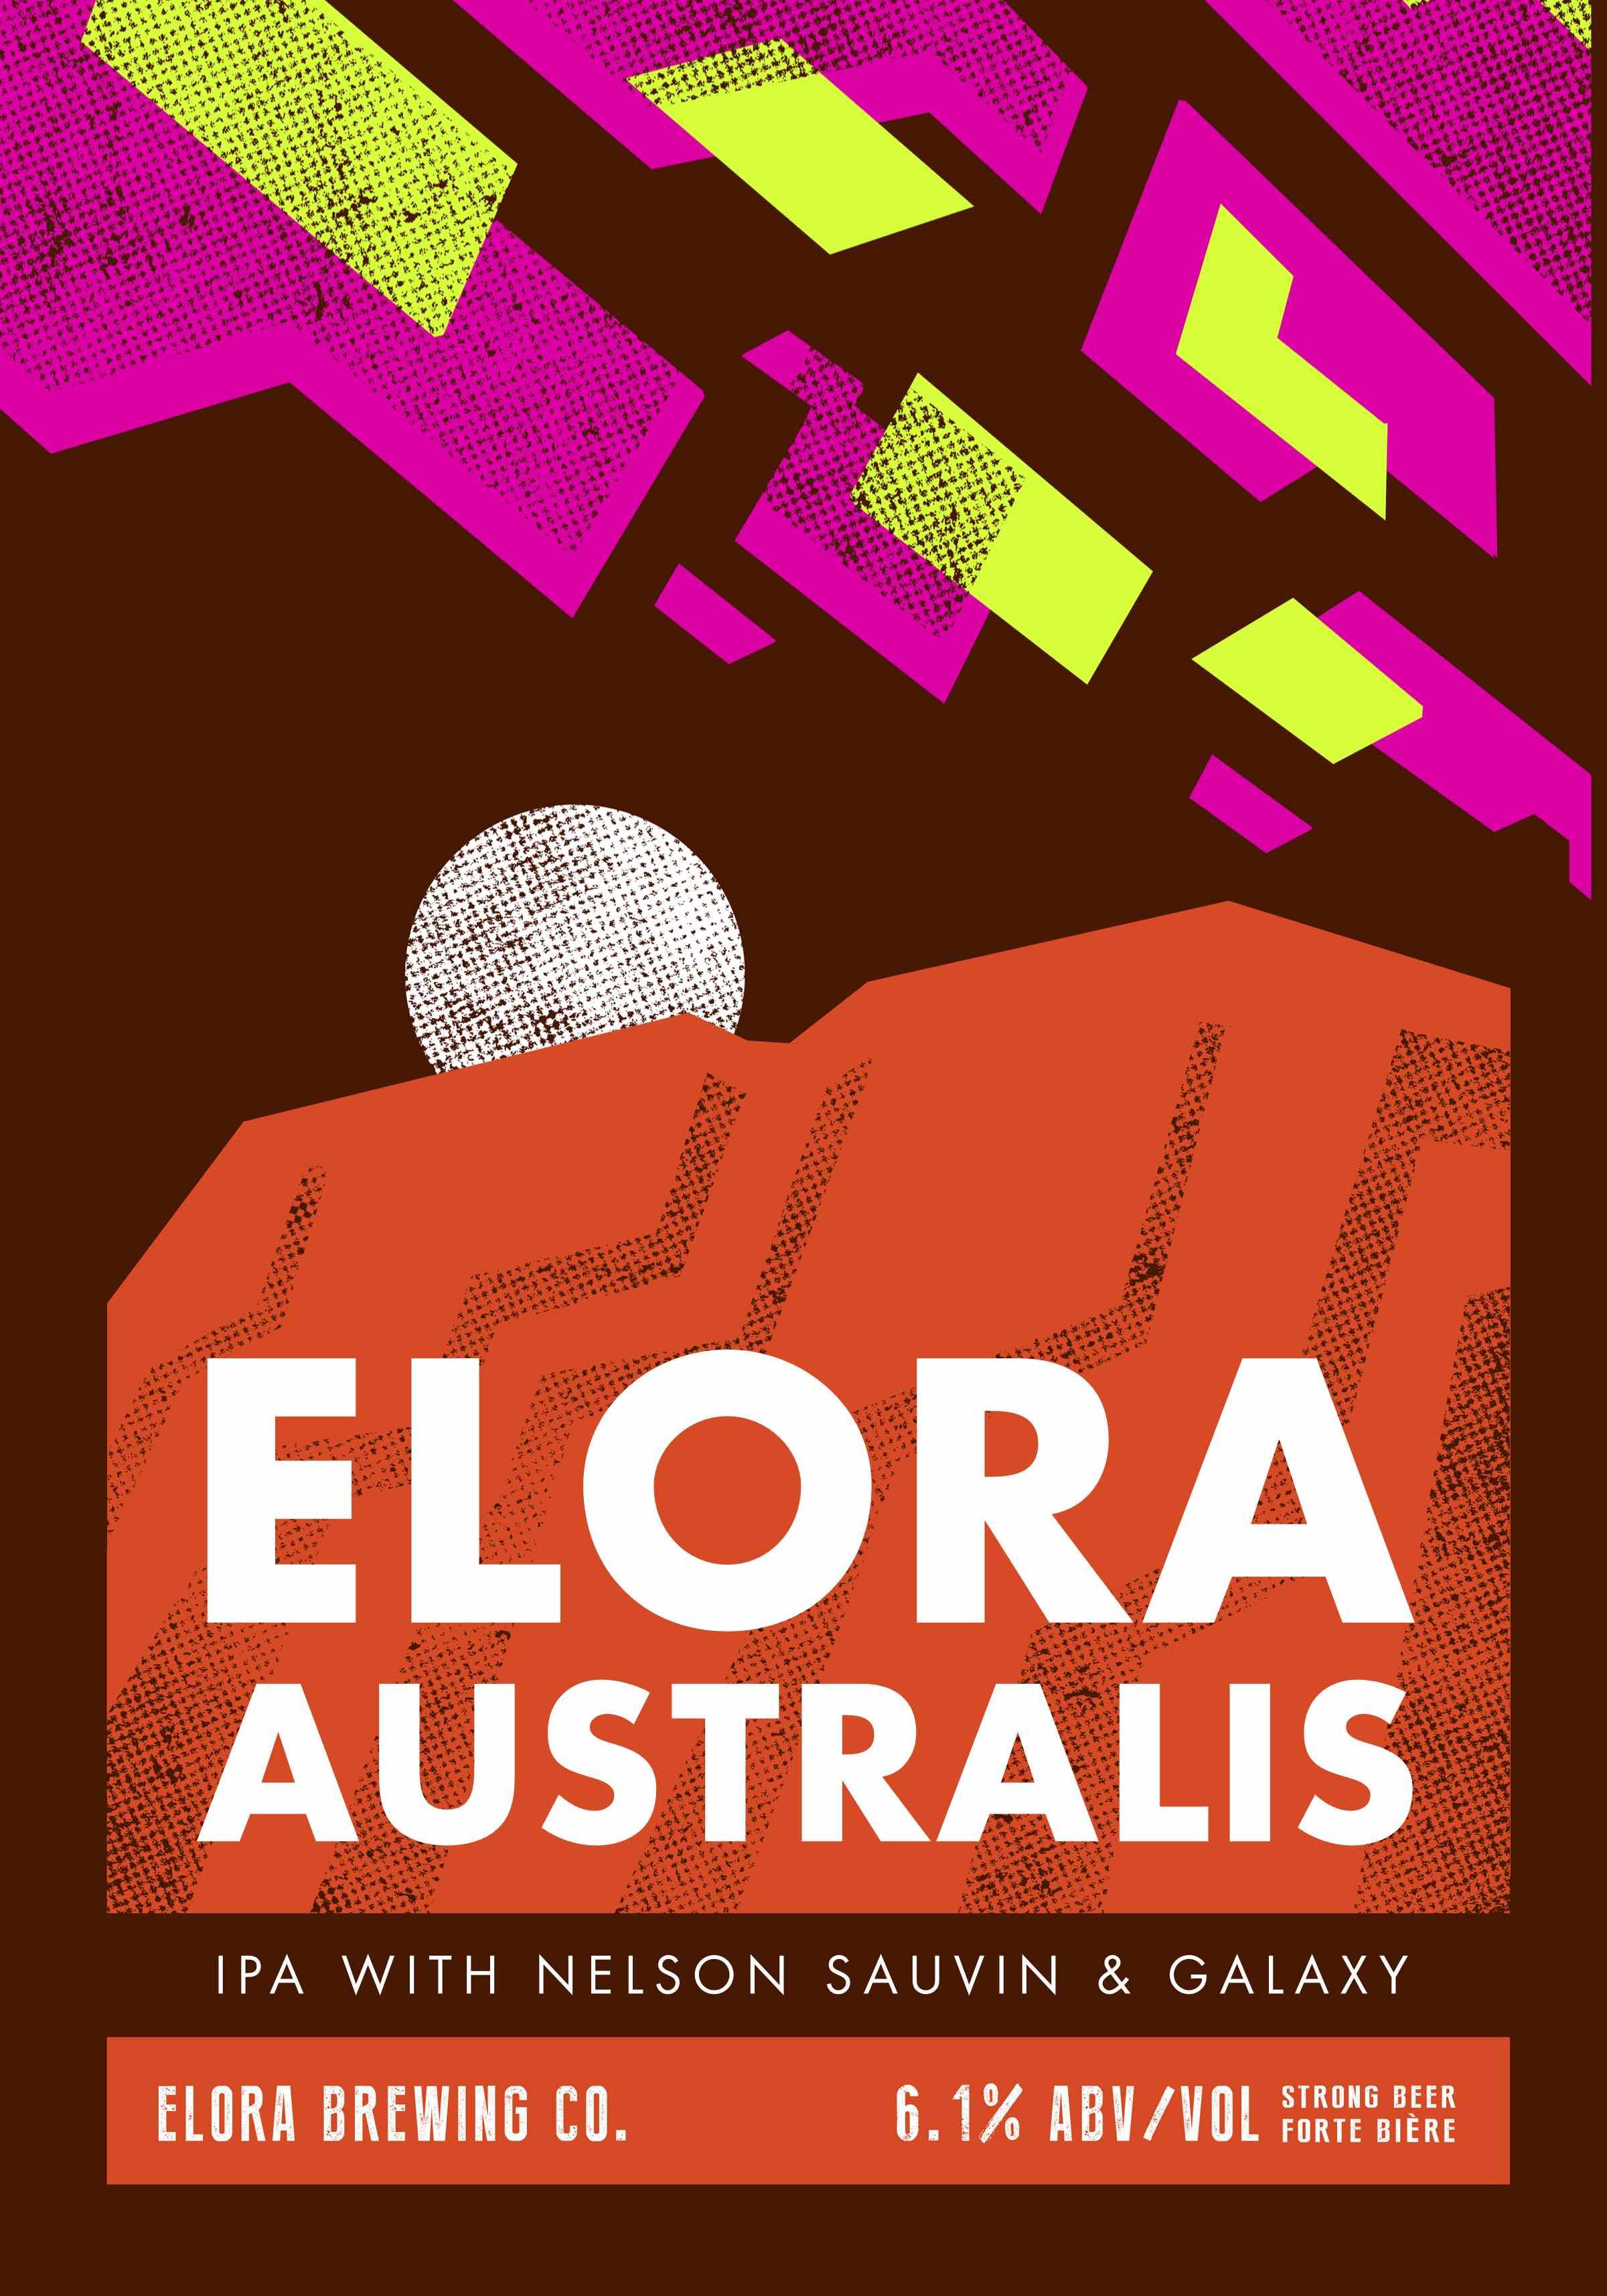 elora-australis.jpg